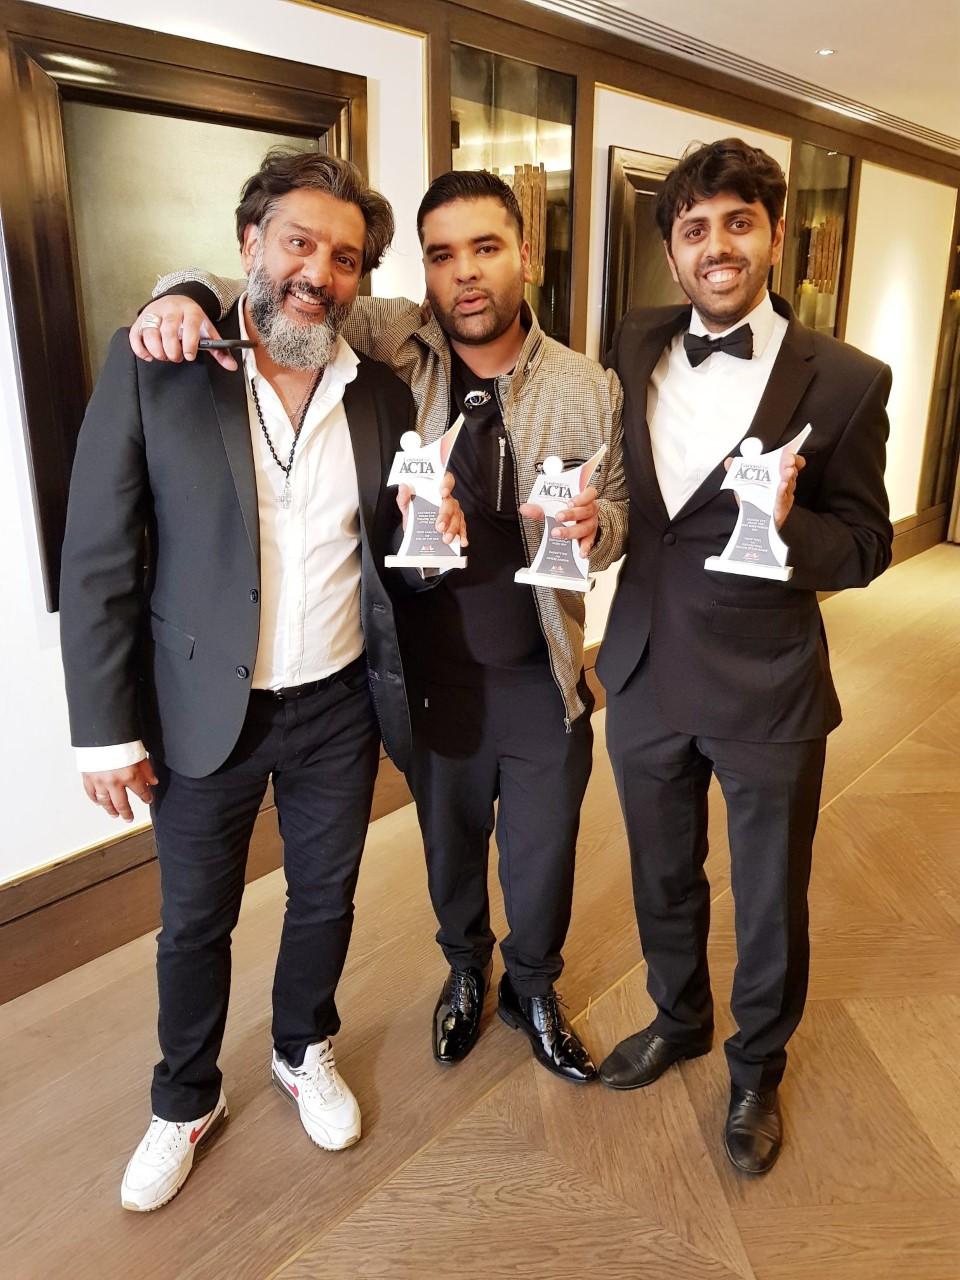 Terrific trio: (from left) Nitin Ganatra, Naughty Boy and Vinay Patel